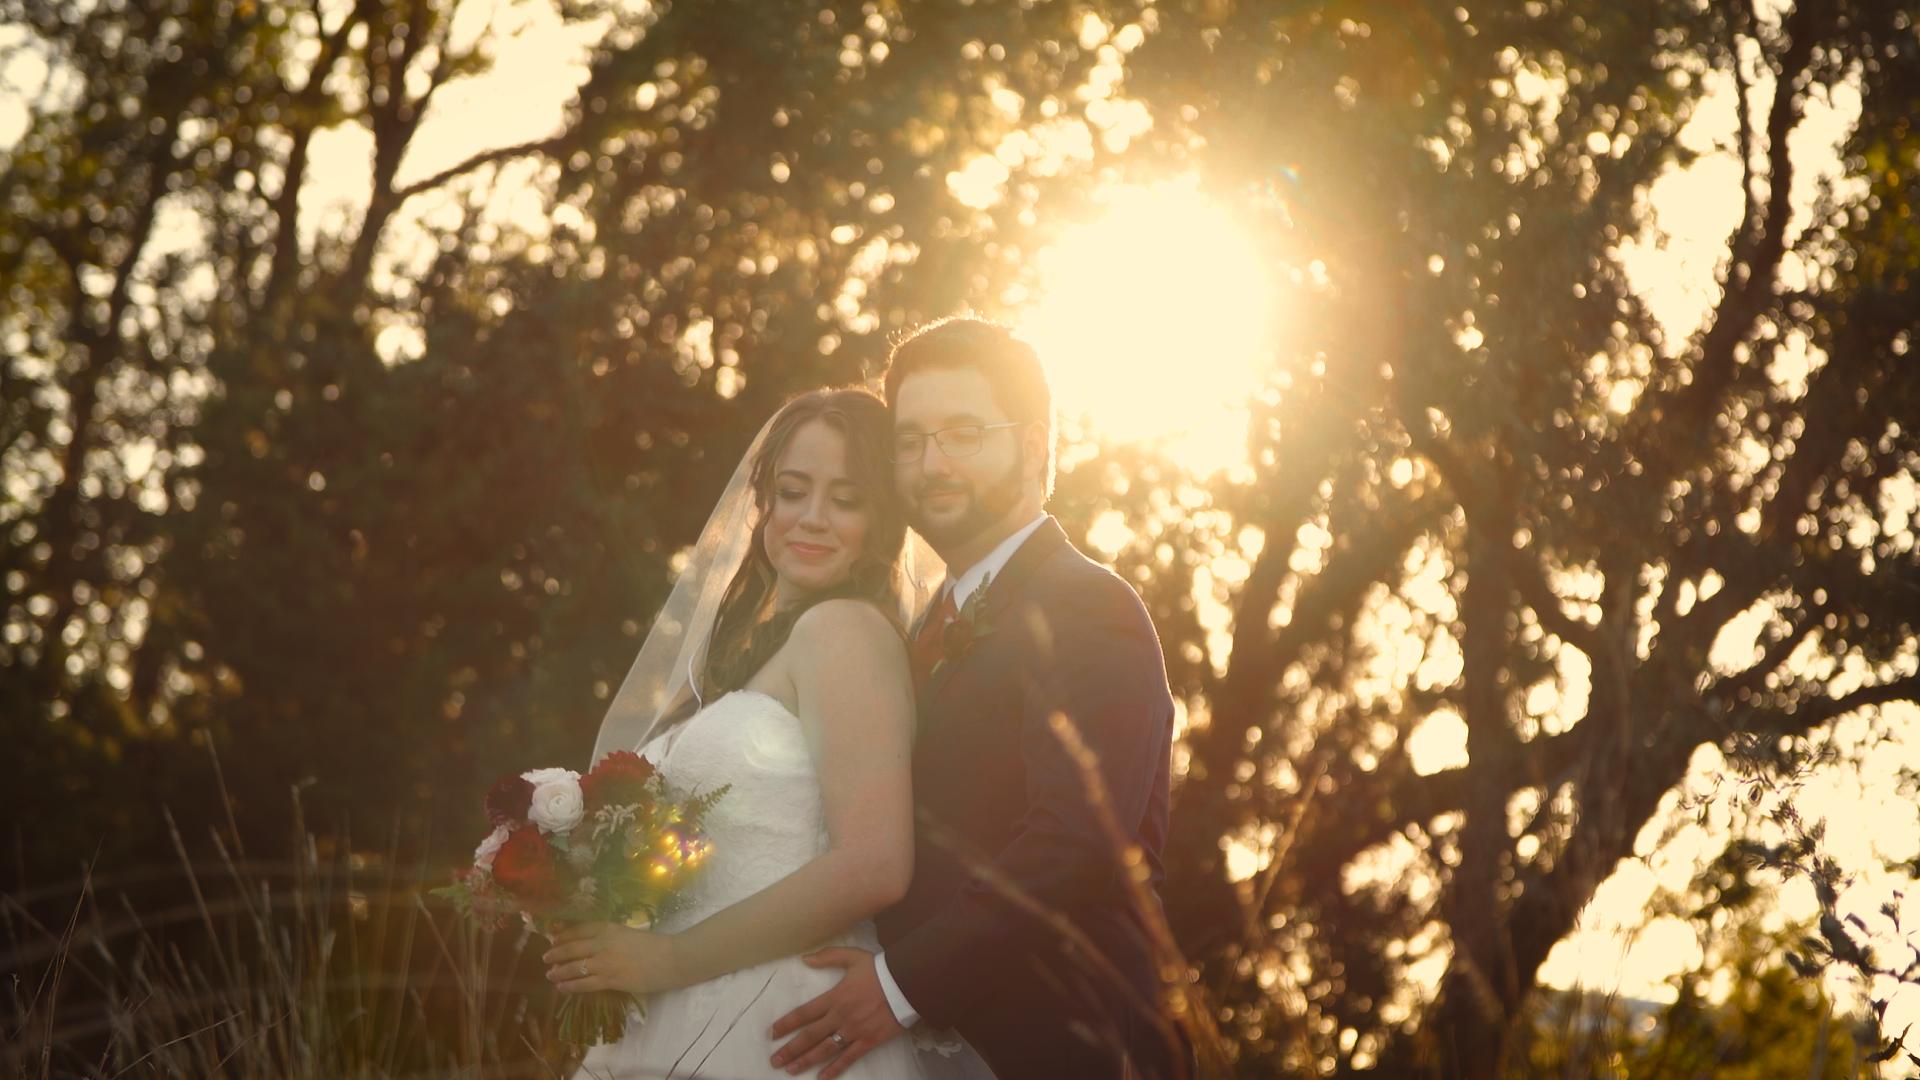 Rebecca_and_Daniel_Wedding_Austin_Texas_Vista_West_Ranch29.png